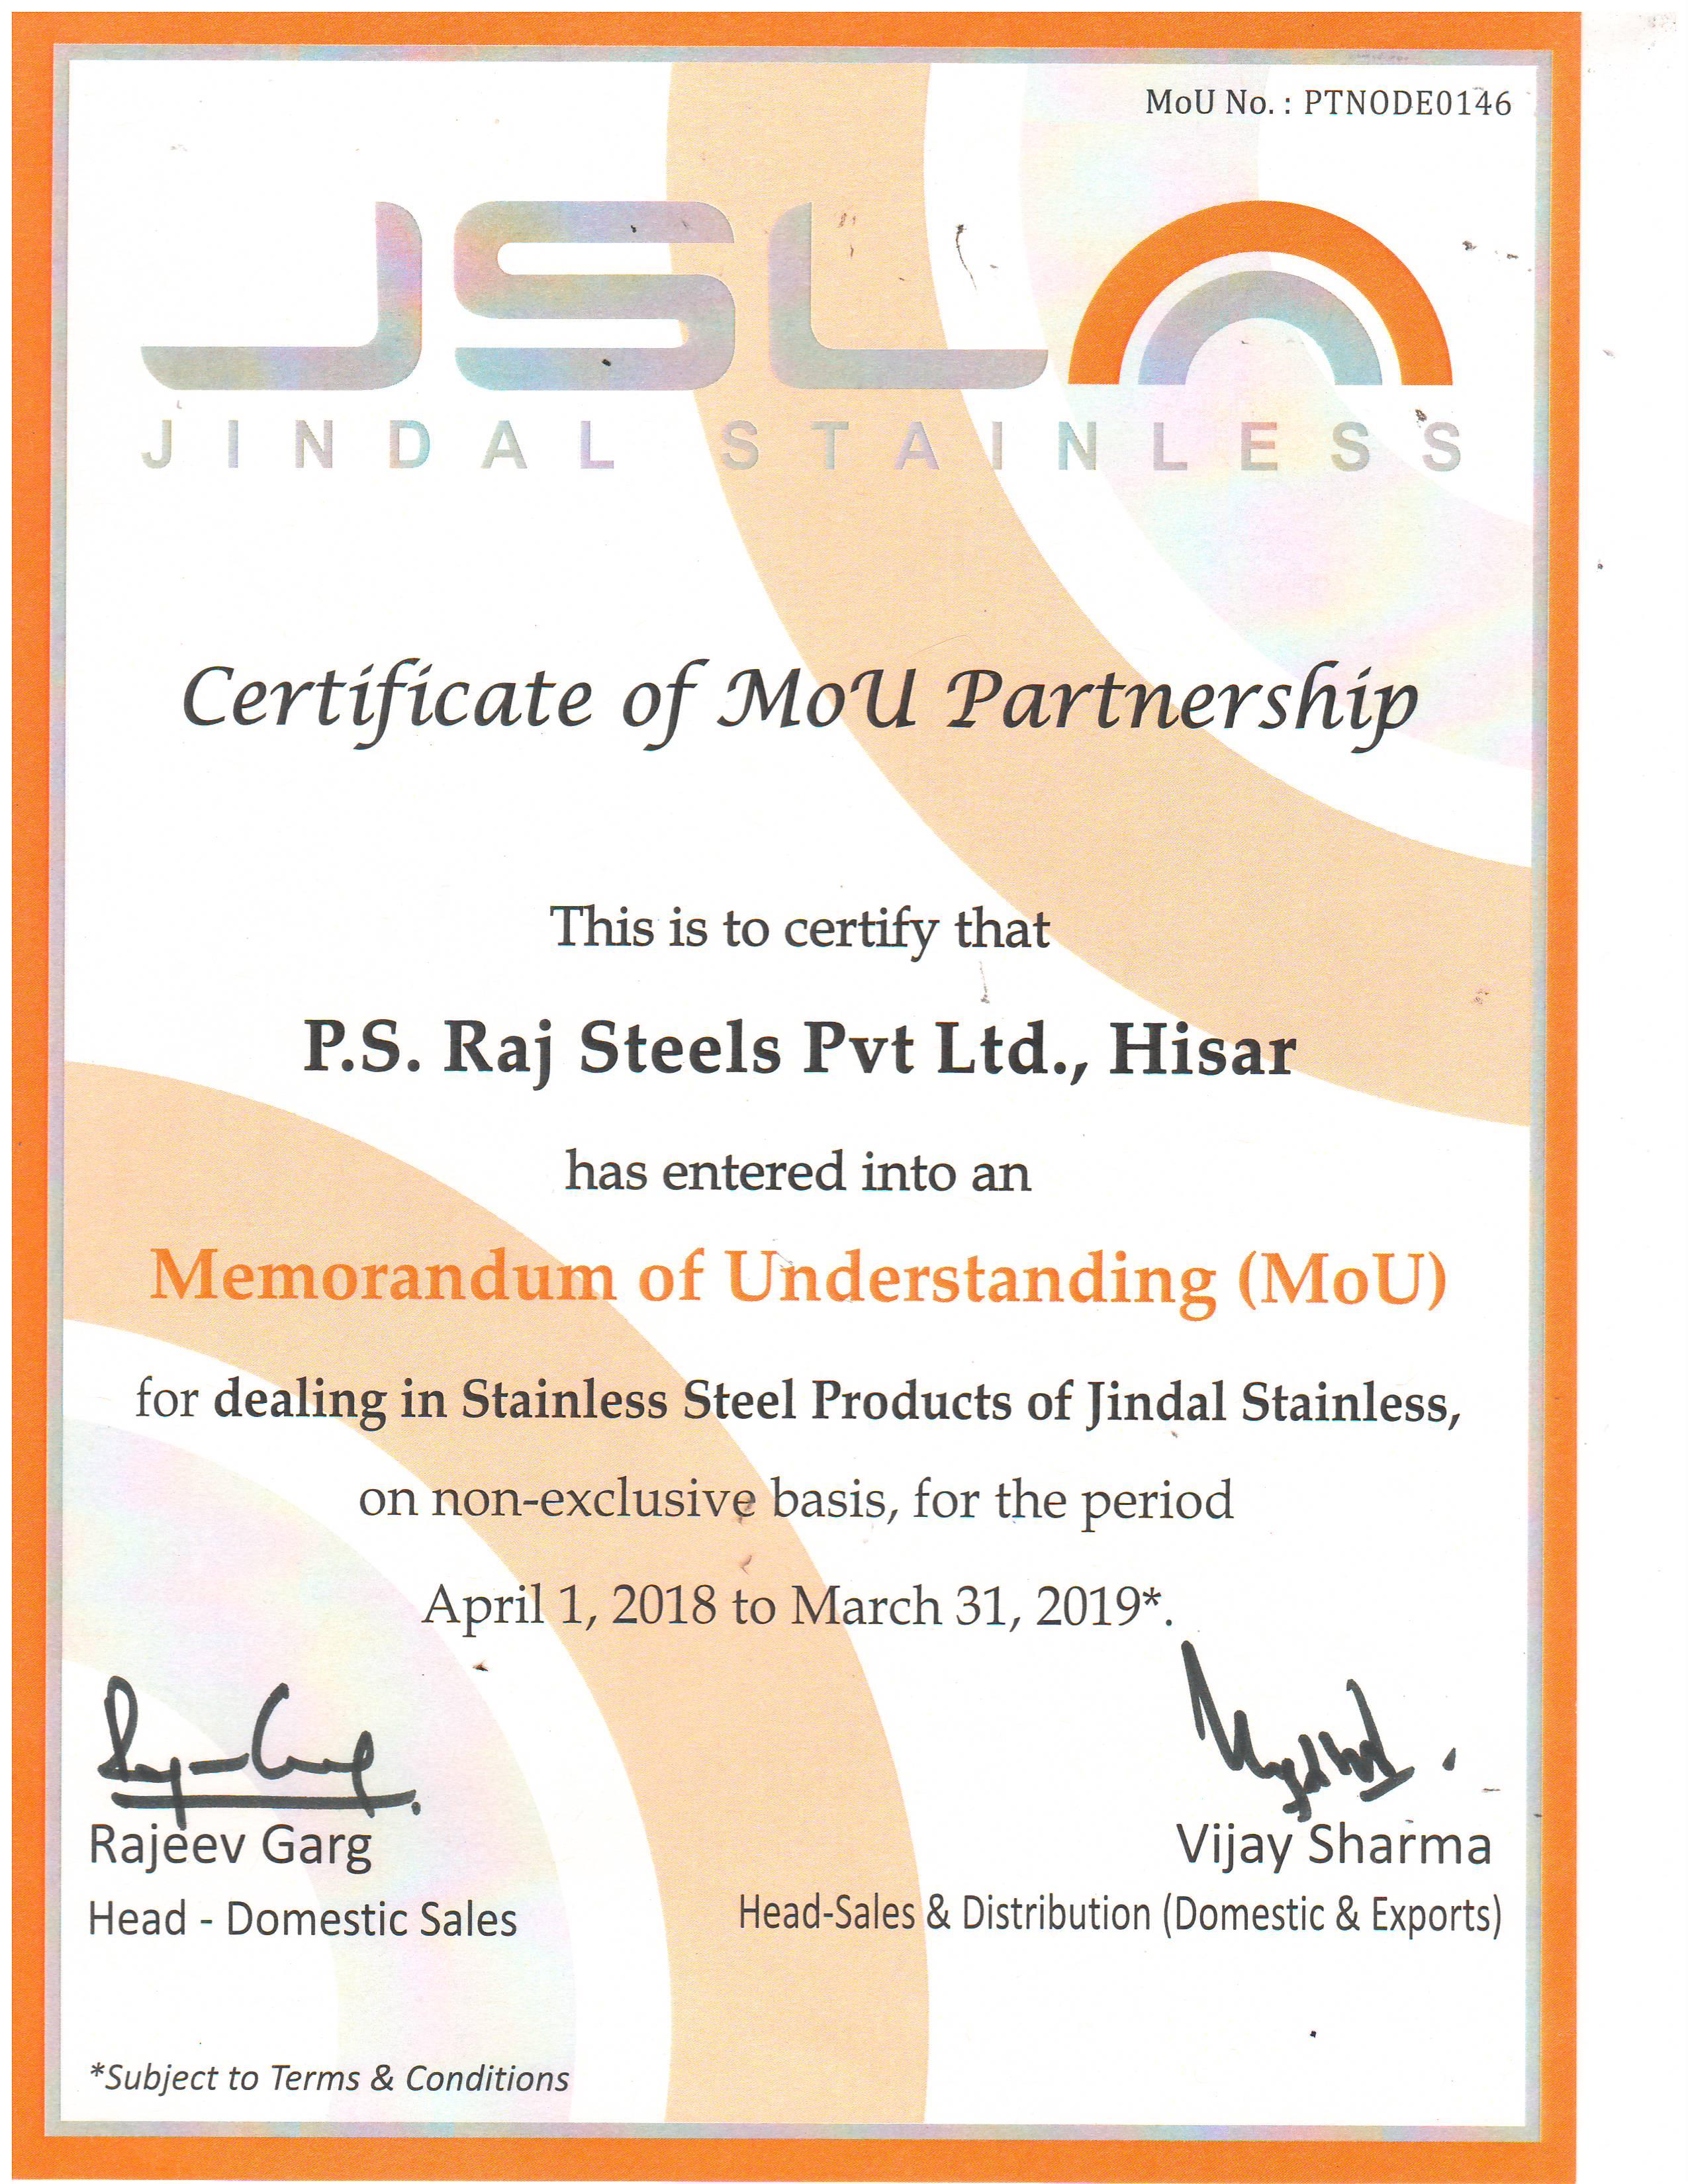 MOU Partnership Certificate